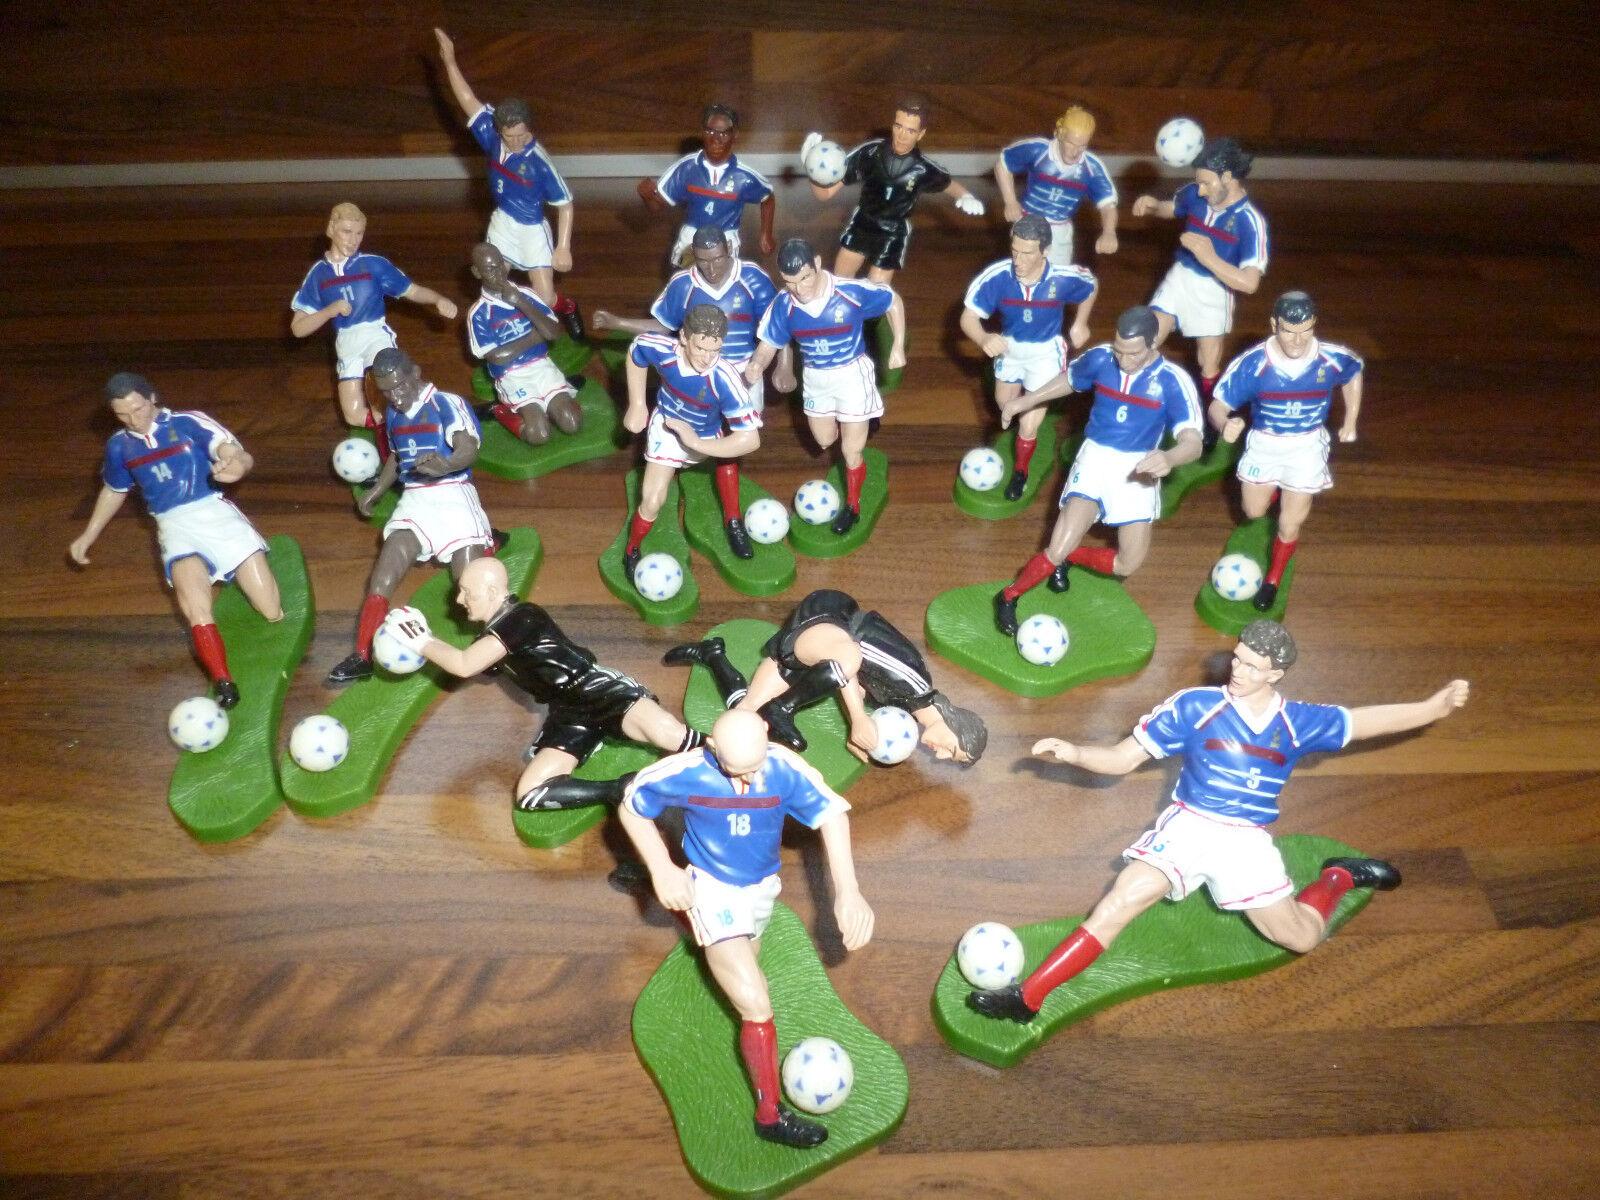 Rare world cup 1998 set of players lead zidane zizou